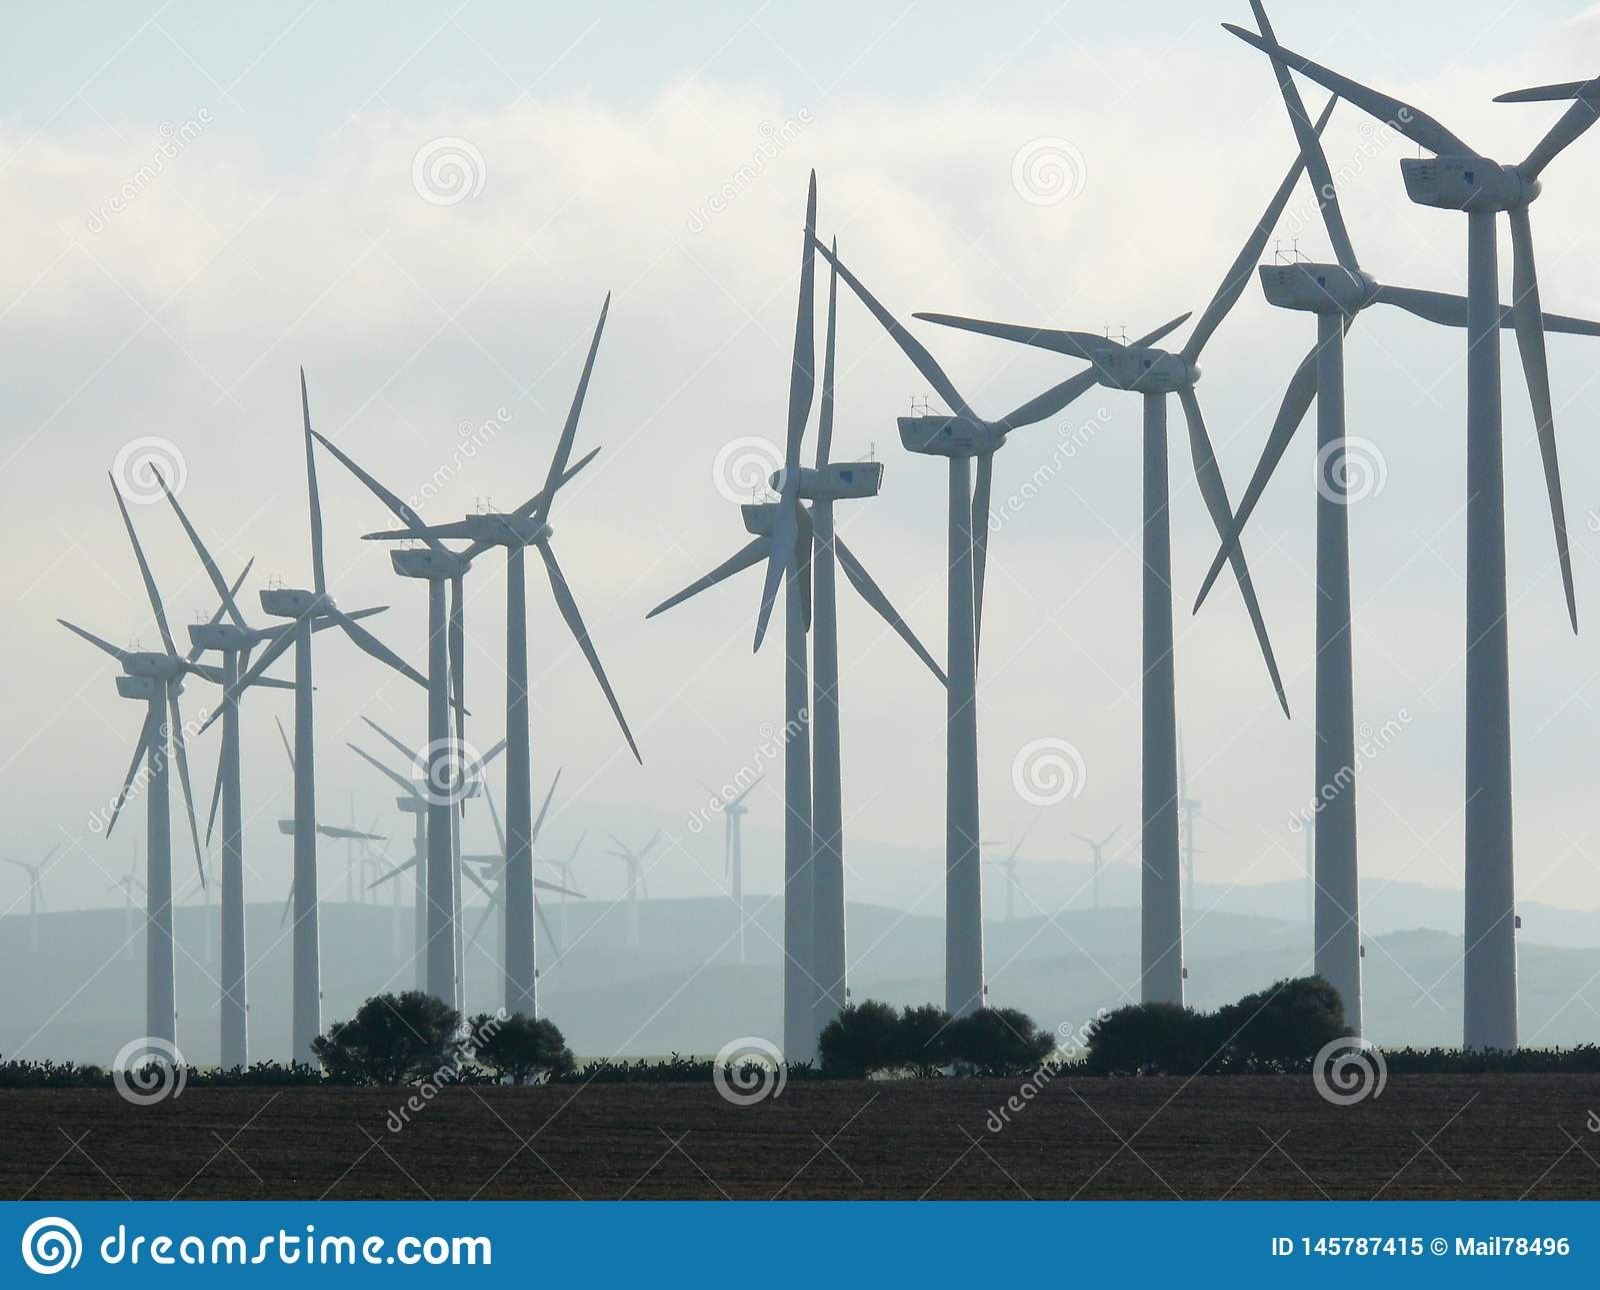 Jerez de la Frontera, Spain.  01/04/2007. Wind farm with high bl